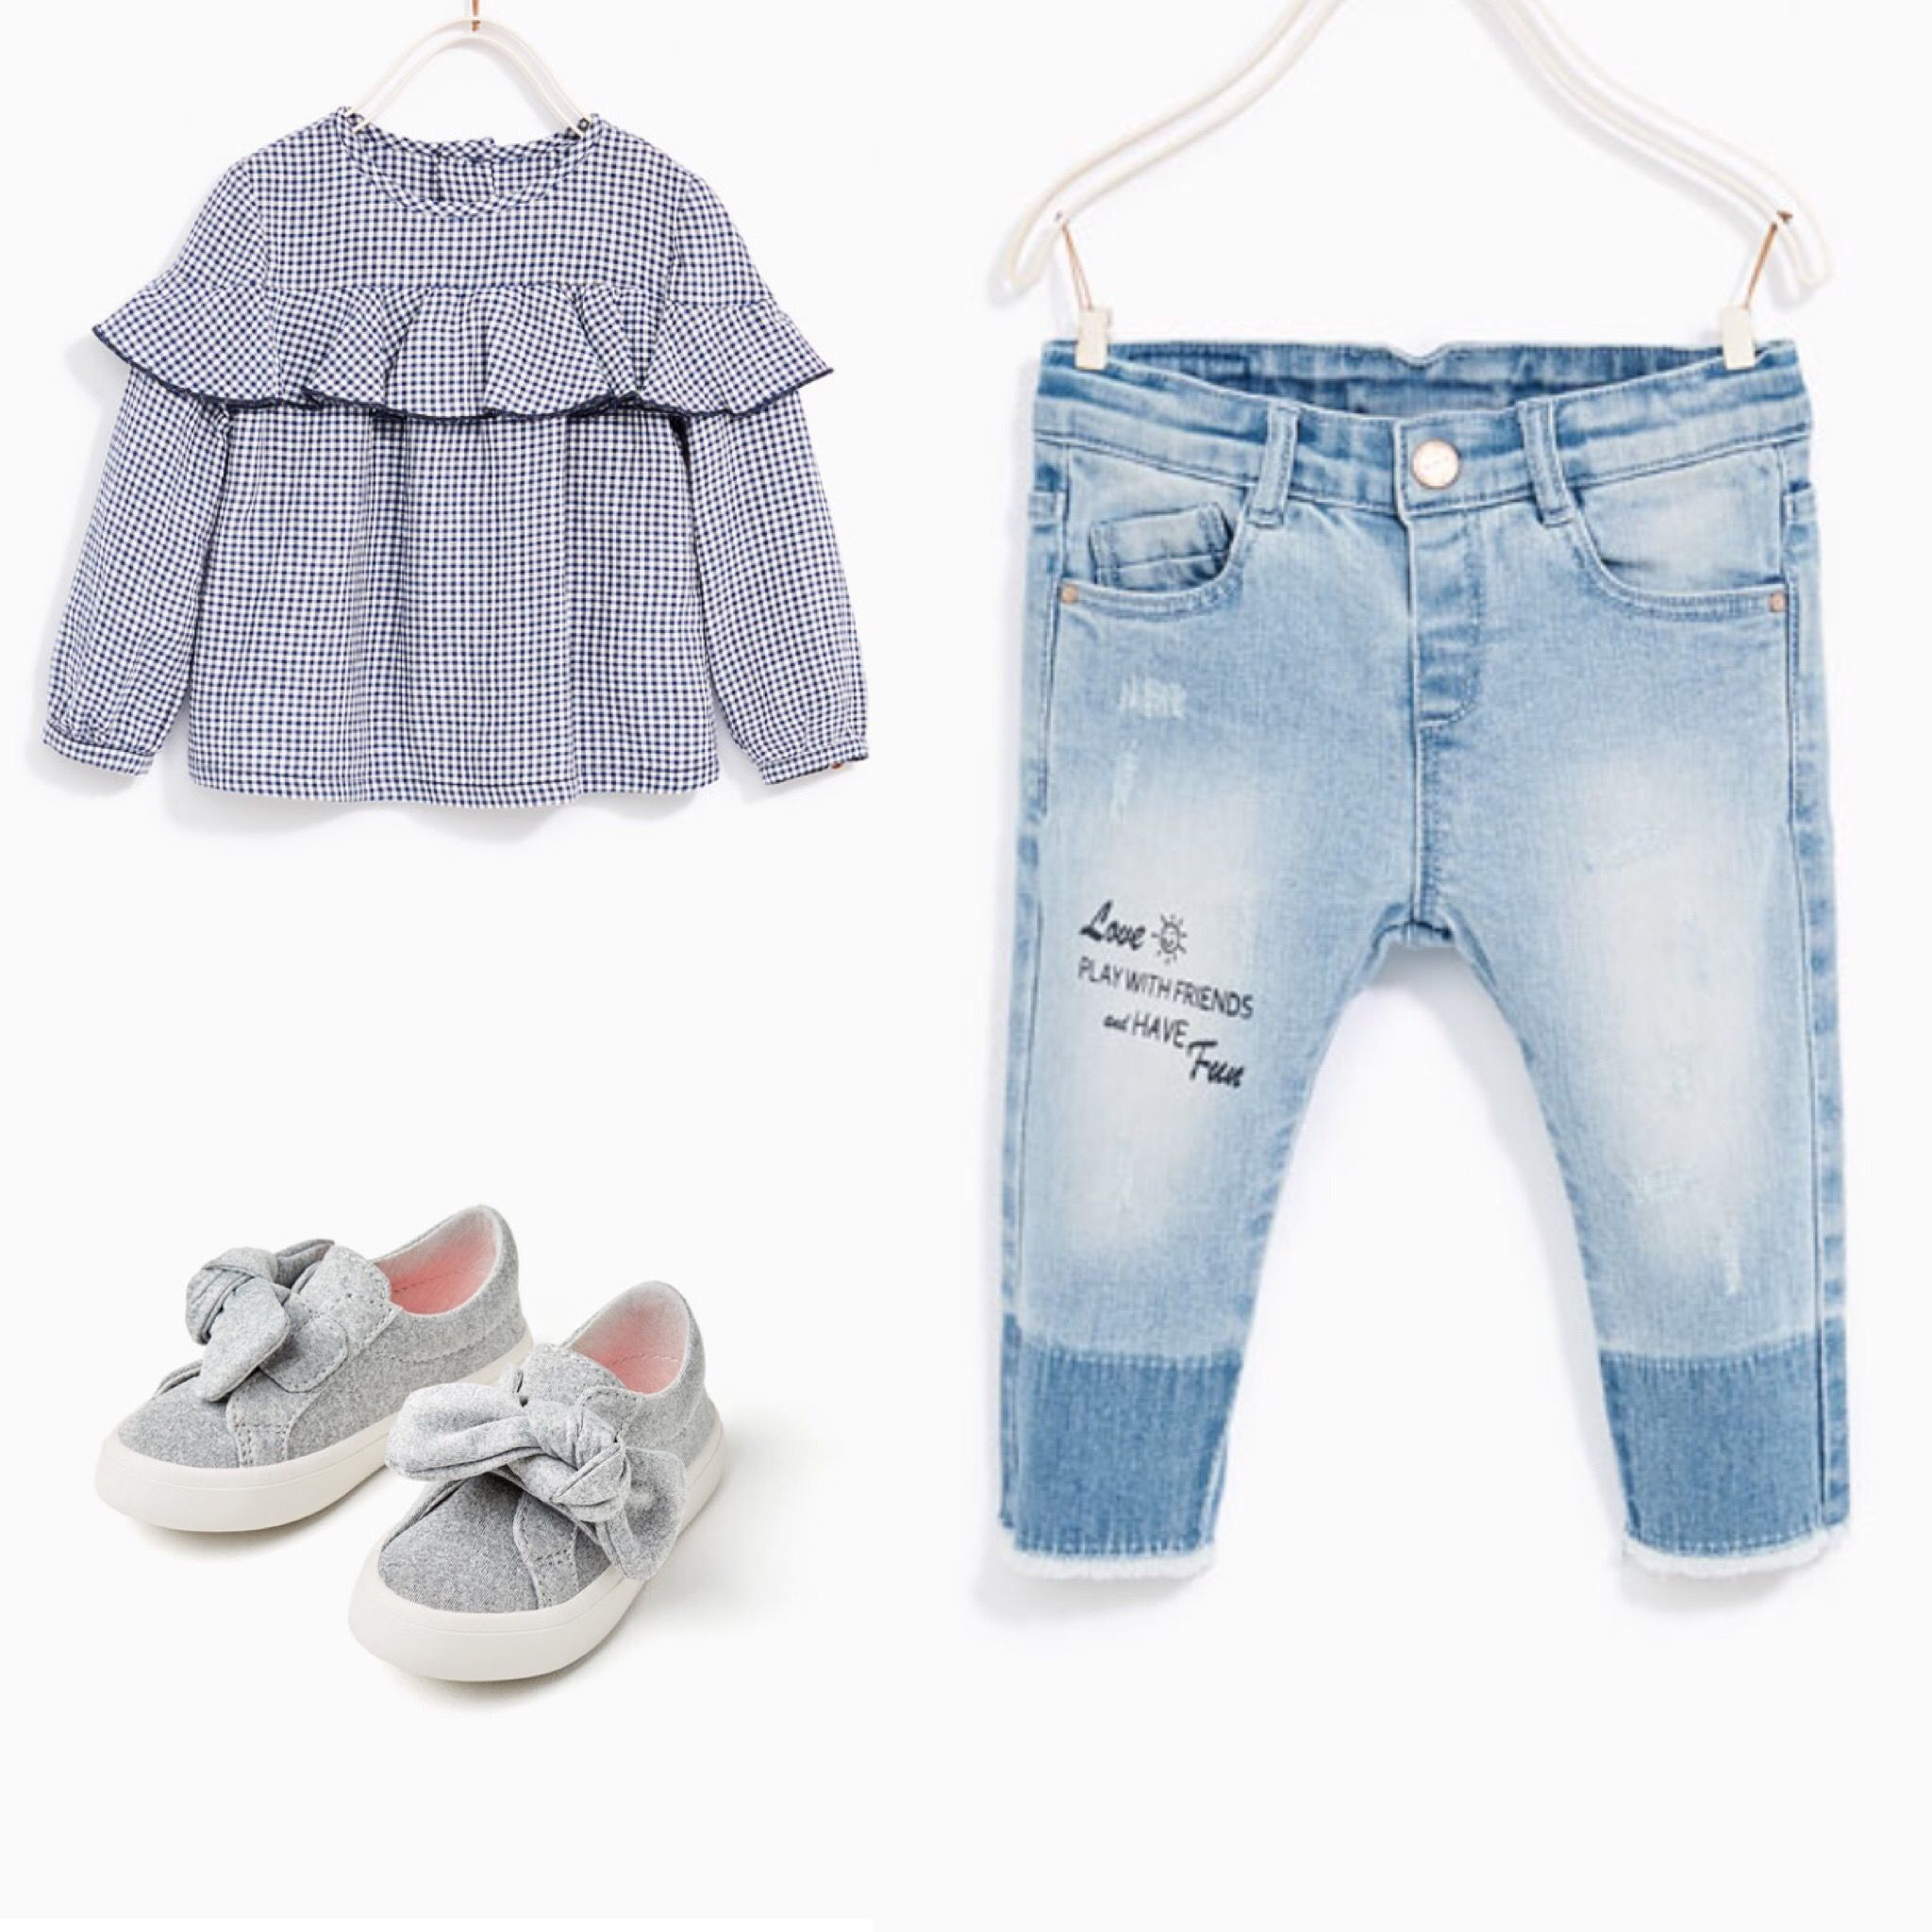 Zara Baby Girl Outfit Idea Gingham Frilled Shirt Jeans With Text And Trainers Zara Spring 2017 Collect Ropa Para Ninas Moda Para Ninas Ropa Linda Para Ninas